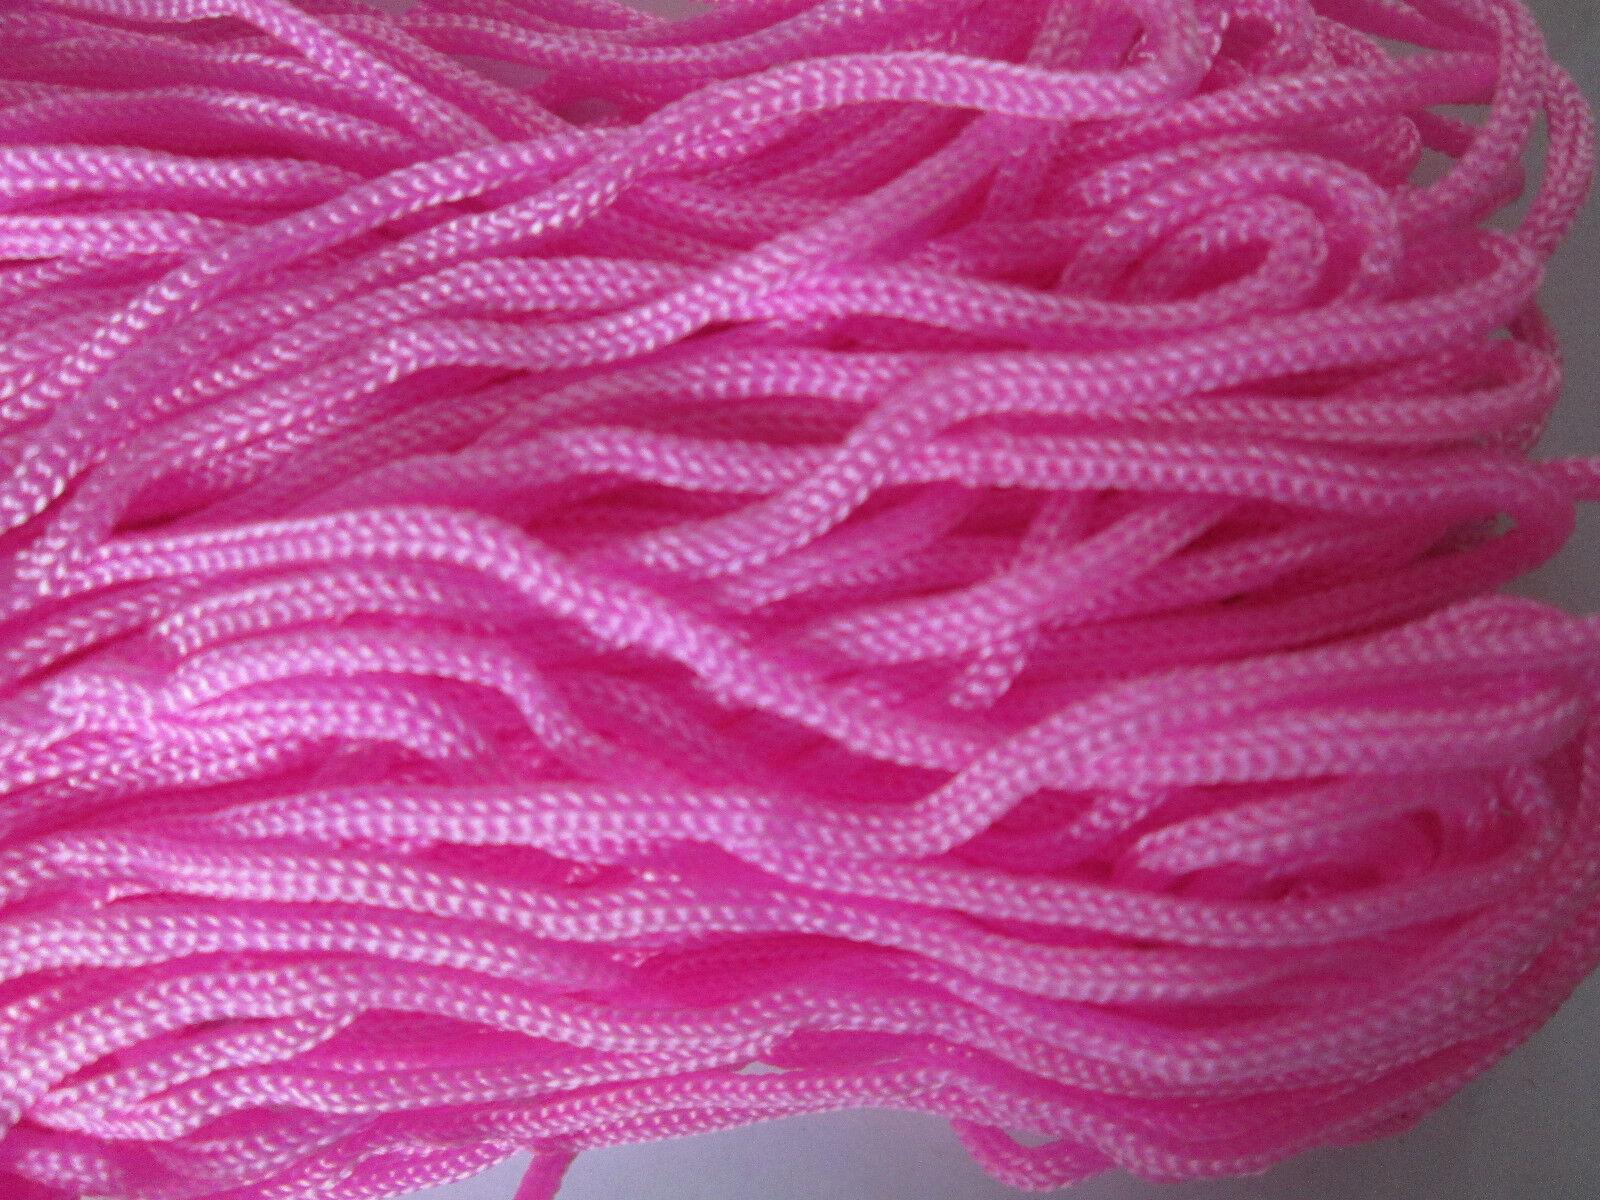 10 METER kordel Satin Dunkel Pink 3mm elegante Borte Spitze KR 009